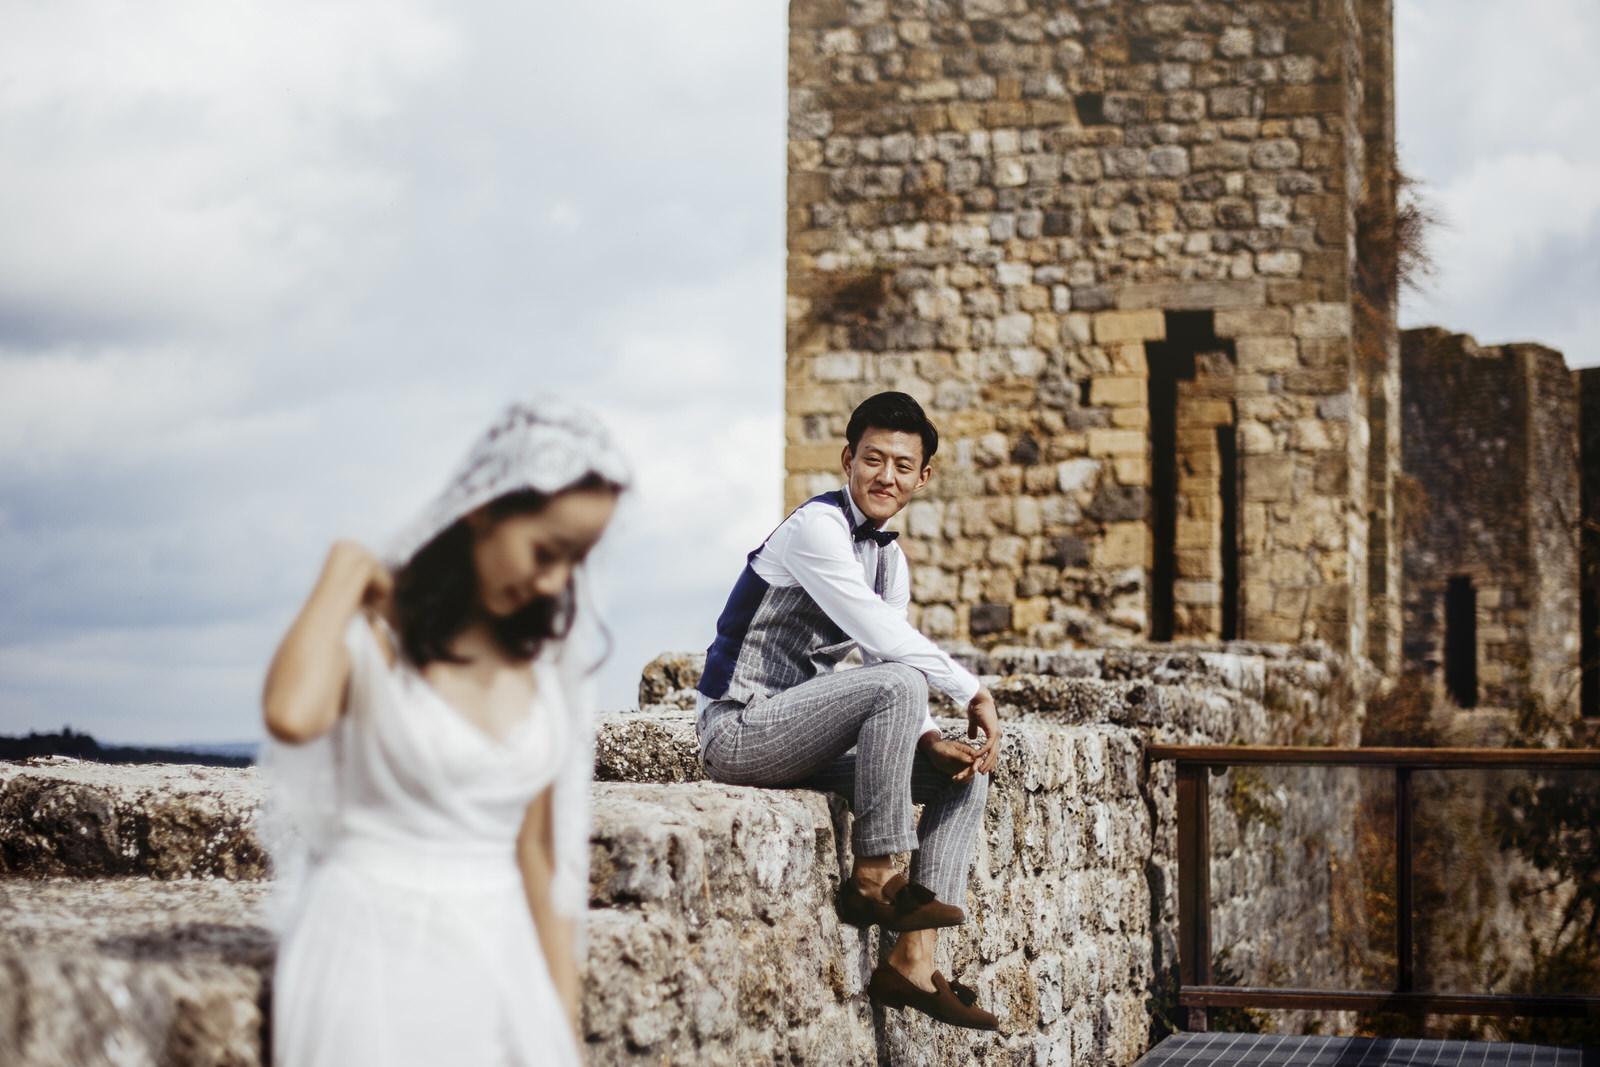 wedding photographer in italy-venice-tuscany-florence-amalfi coast-como lake-villa del balbianello-siena-amalfi-ravello-belmond-villa cimbrone55